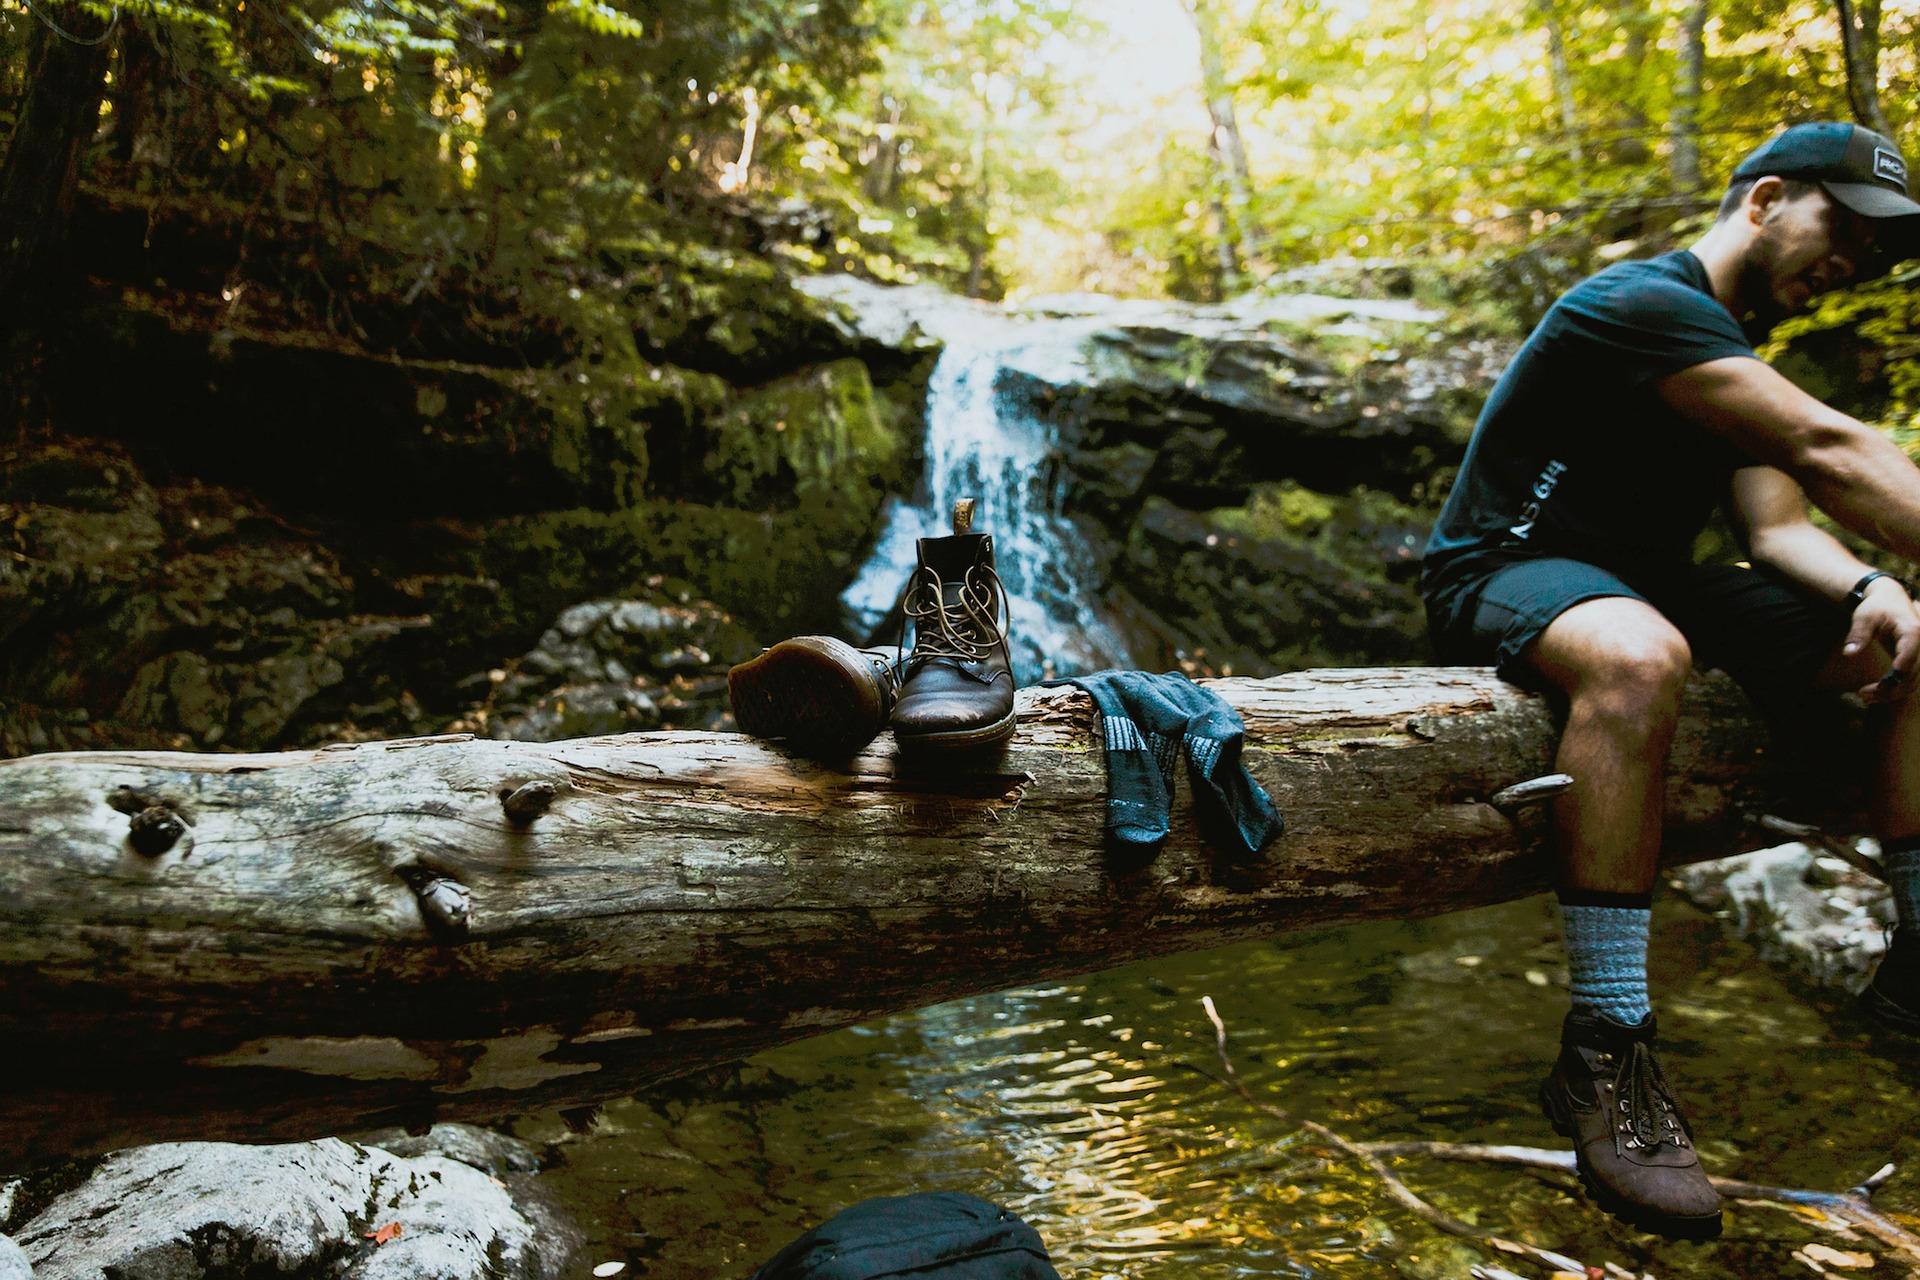 hiking boots waterfall pixabay